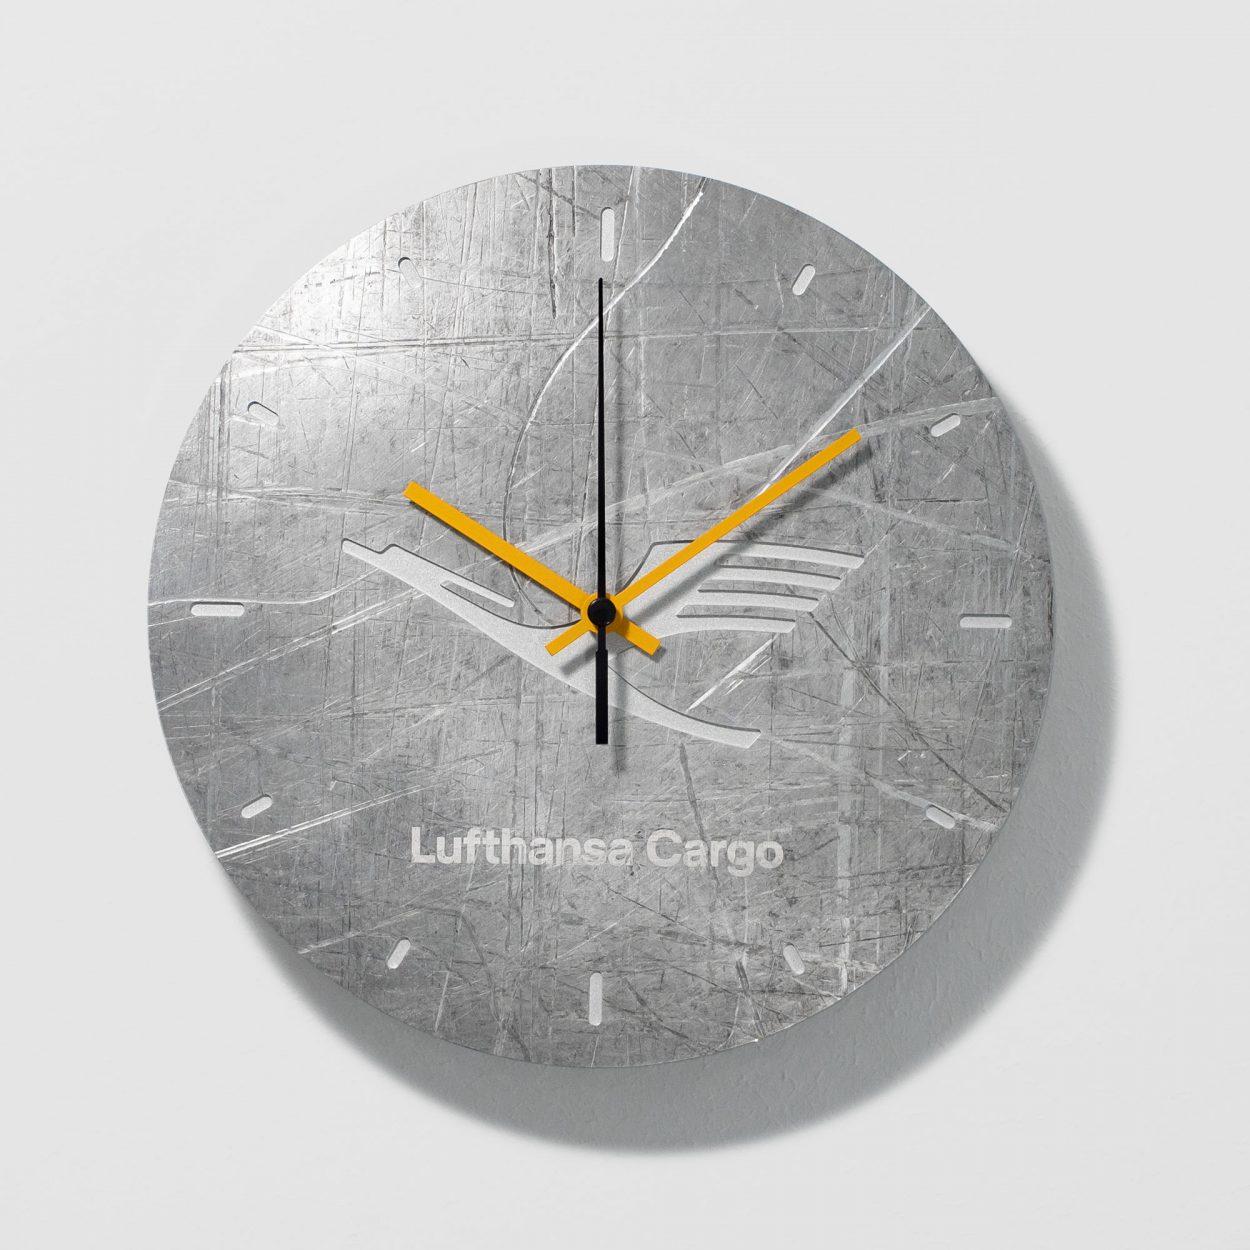 Lufthansa Cargo Wanduhr aus upcycling Luftfahrt Aluminium - Design IRED